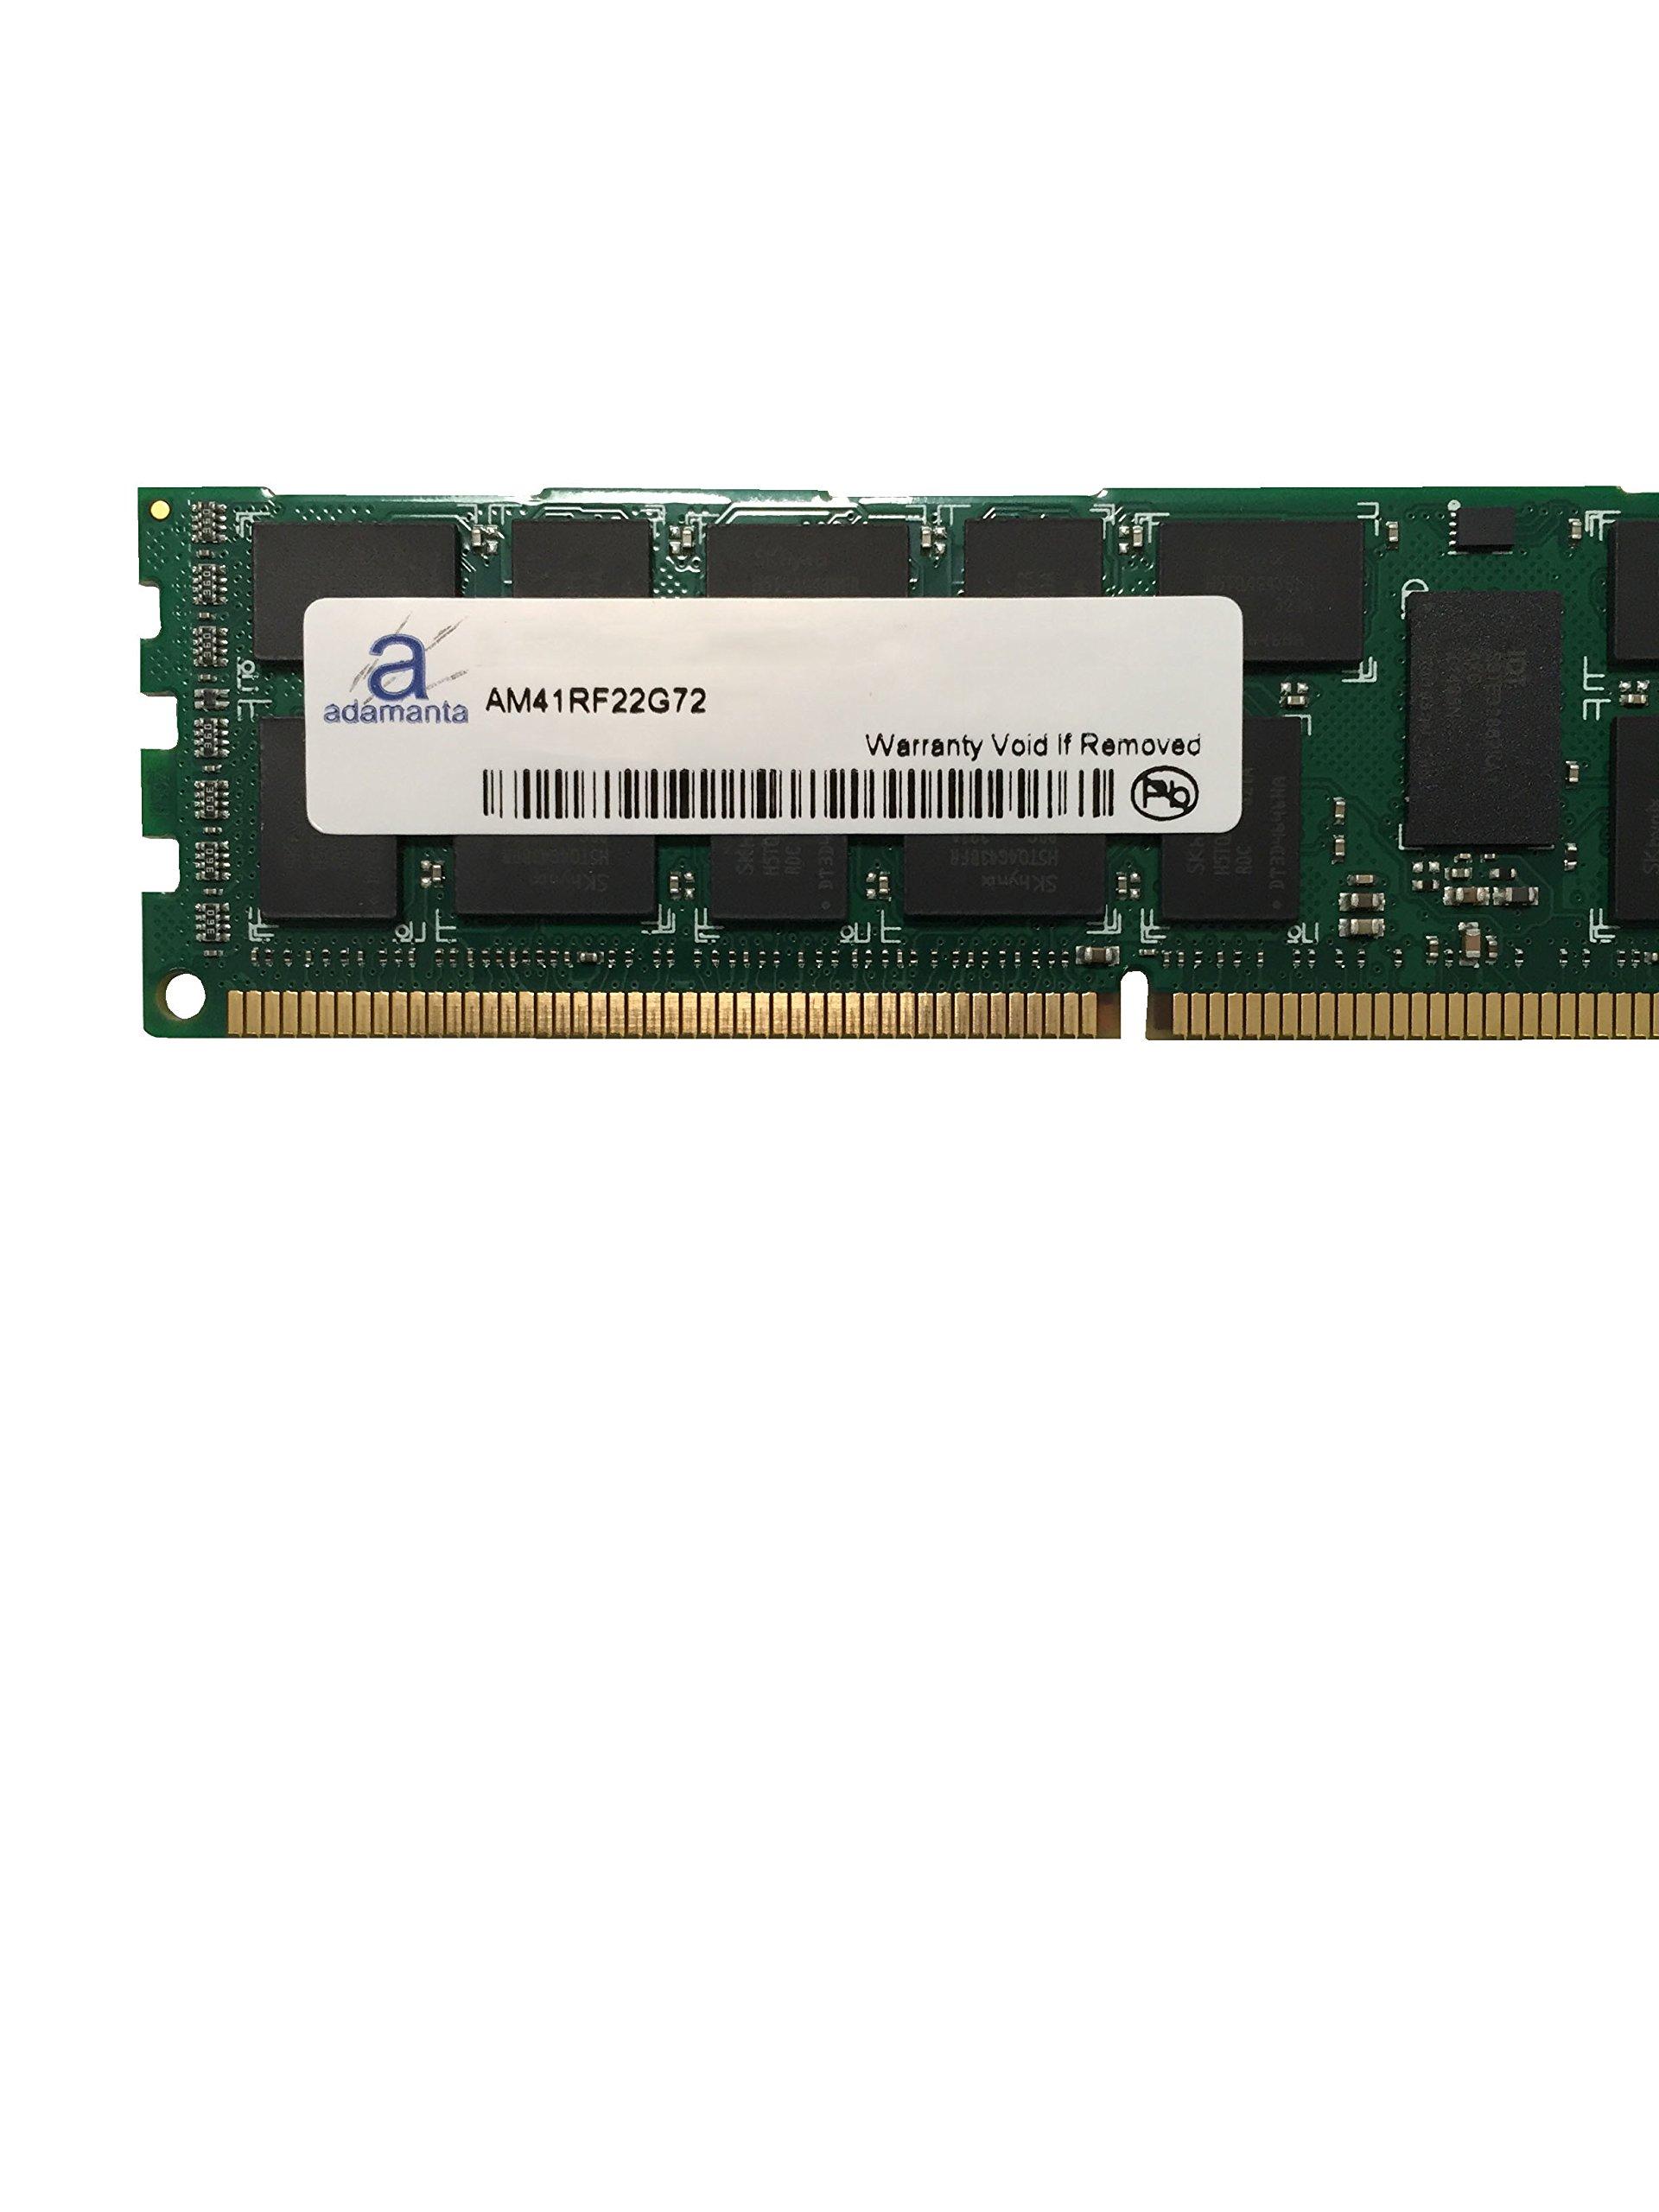 Adamanta 32GB (2x16GB) Server Memory Upgrade for Dell PowerEdge T320 DDR3 1600Mhz PC3-12800 ECC Registered 2Rx4 CL11 1.5v by Adamanta Memory (Image #3)